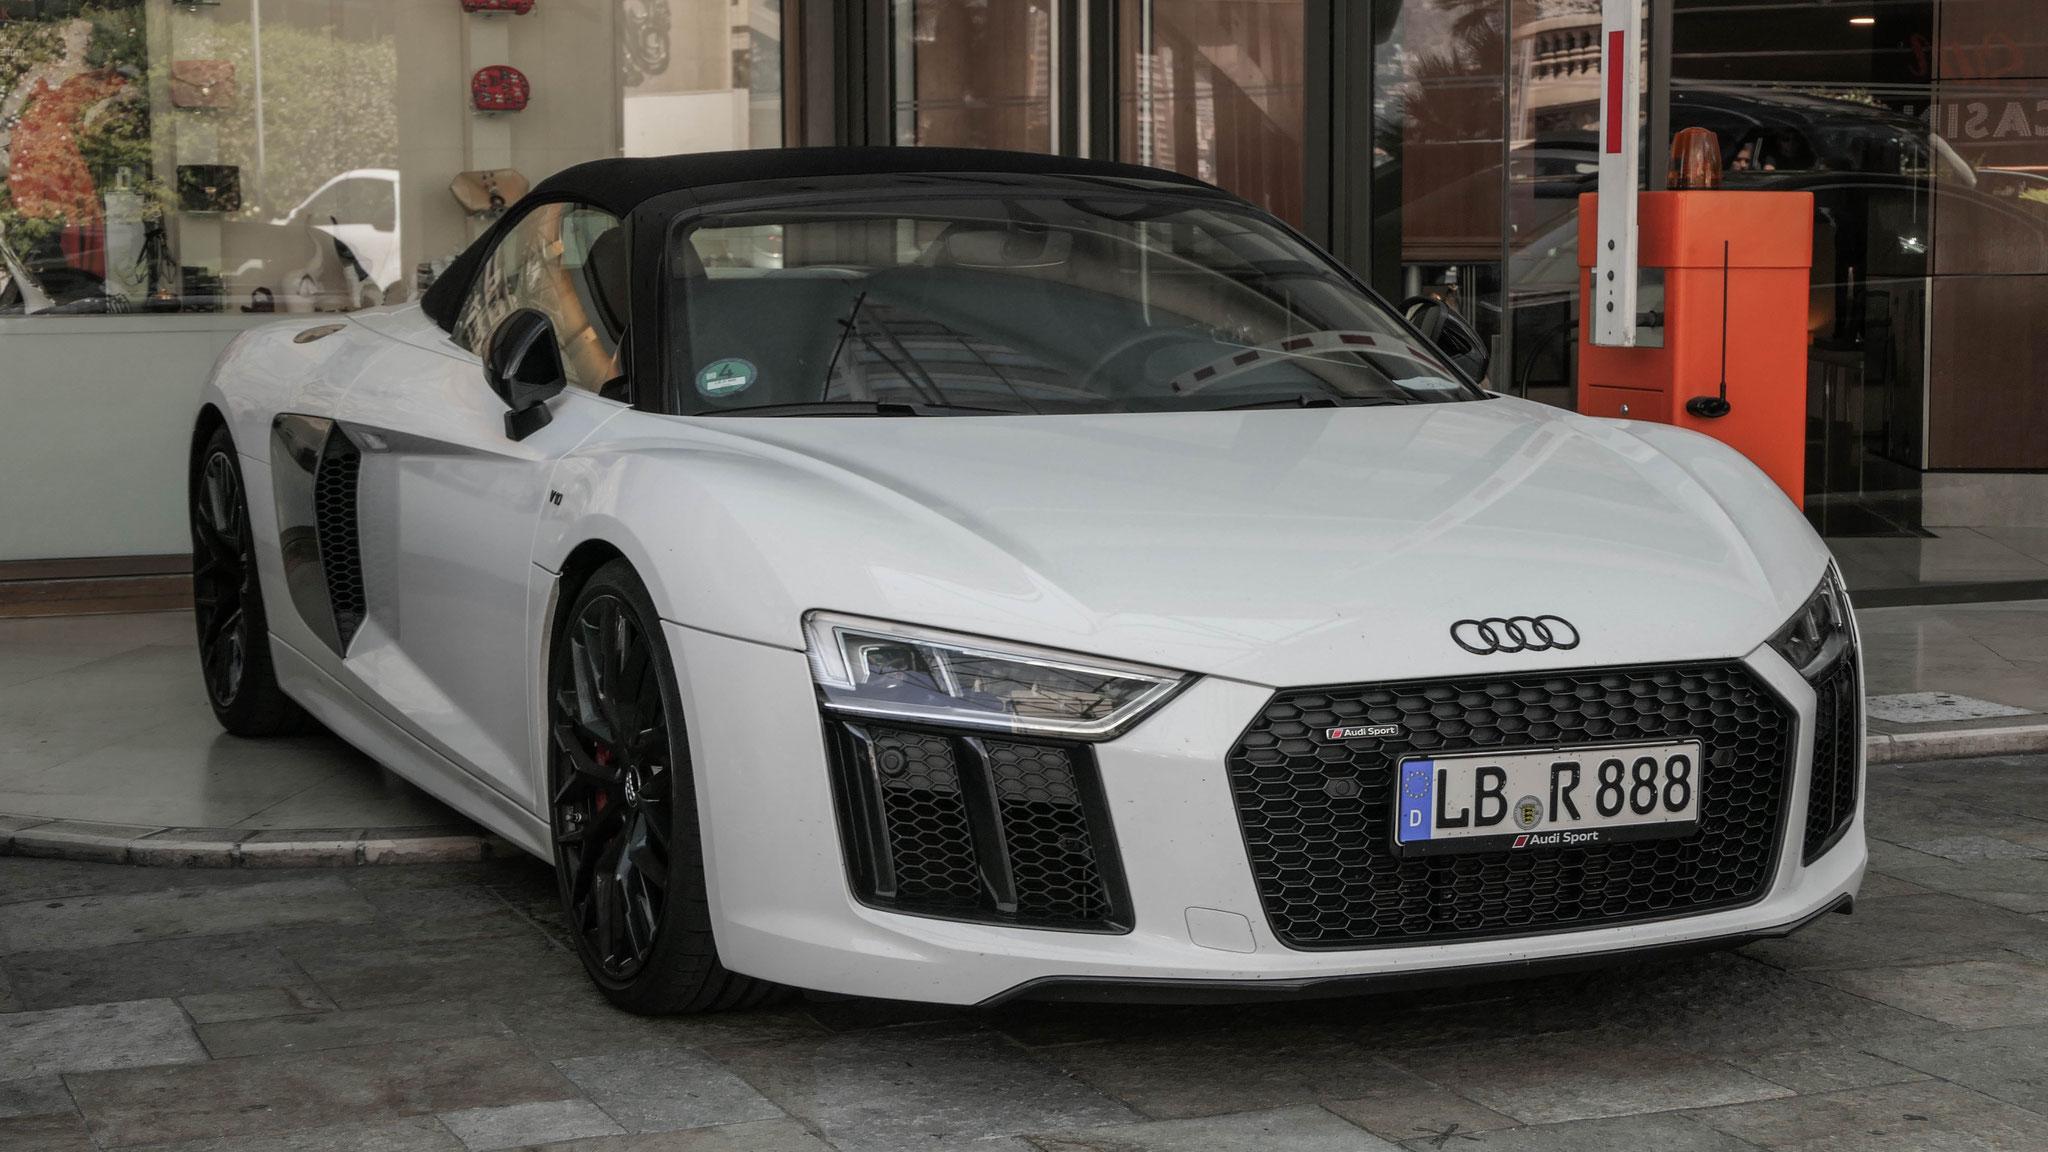 Audi R8 V10 Spyder - LB-R-888